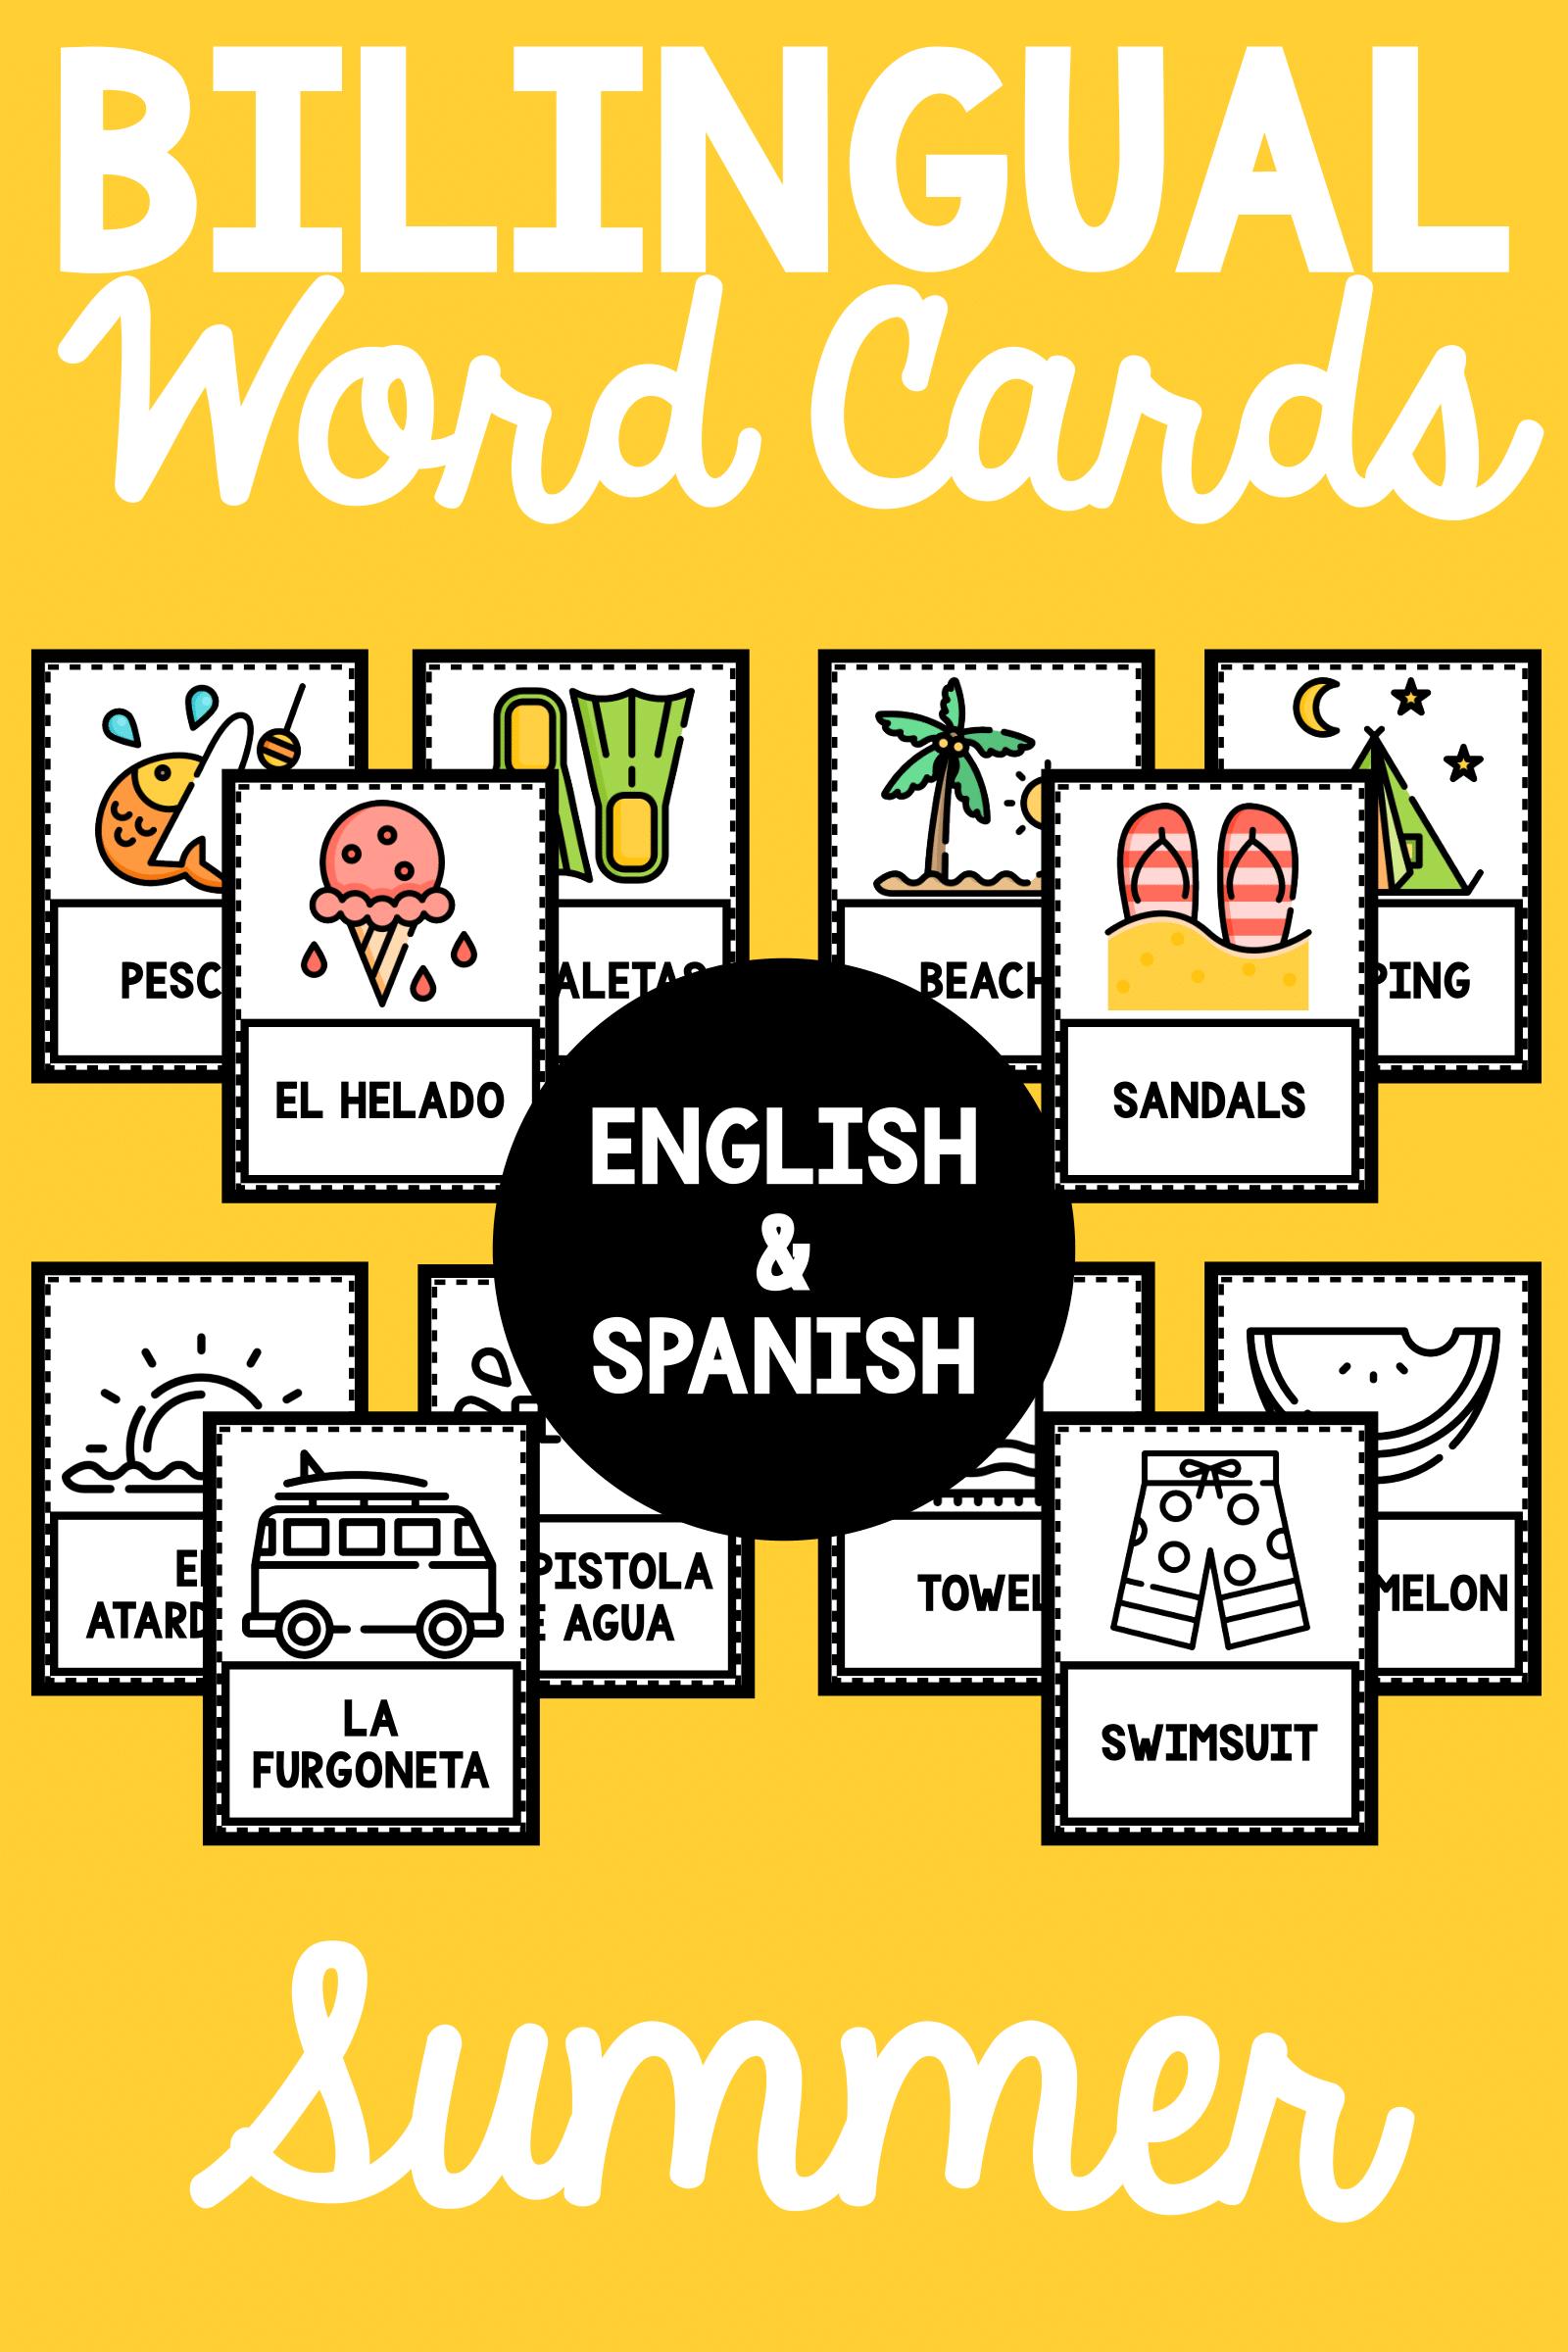 Bilingual Summer Word Cards   Vocabulary ideas, Portable word walls ...